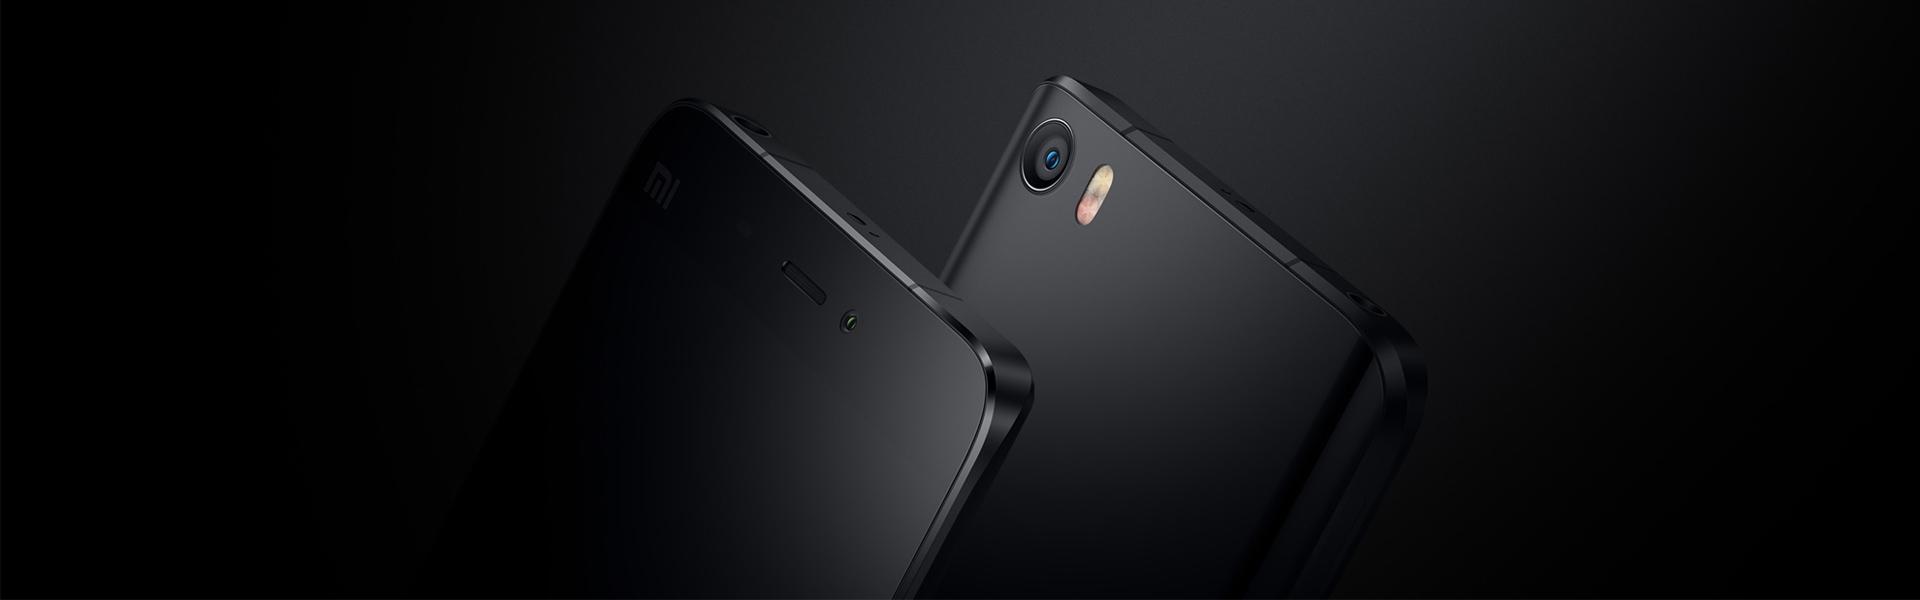 Xiaomi Mi 5 can be the genuine flagship killer